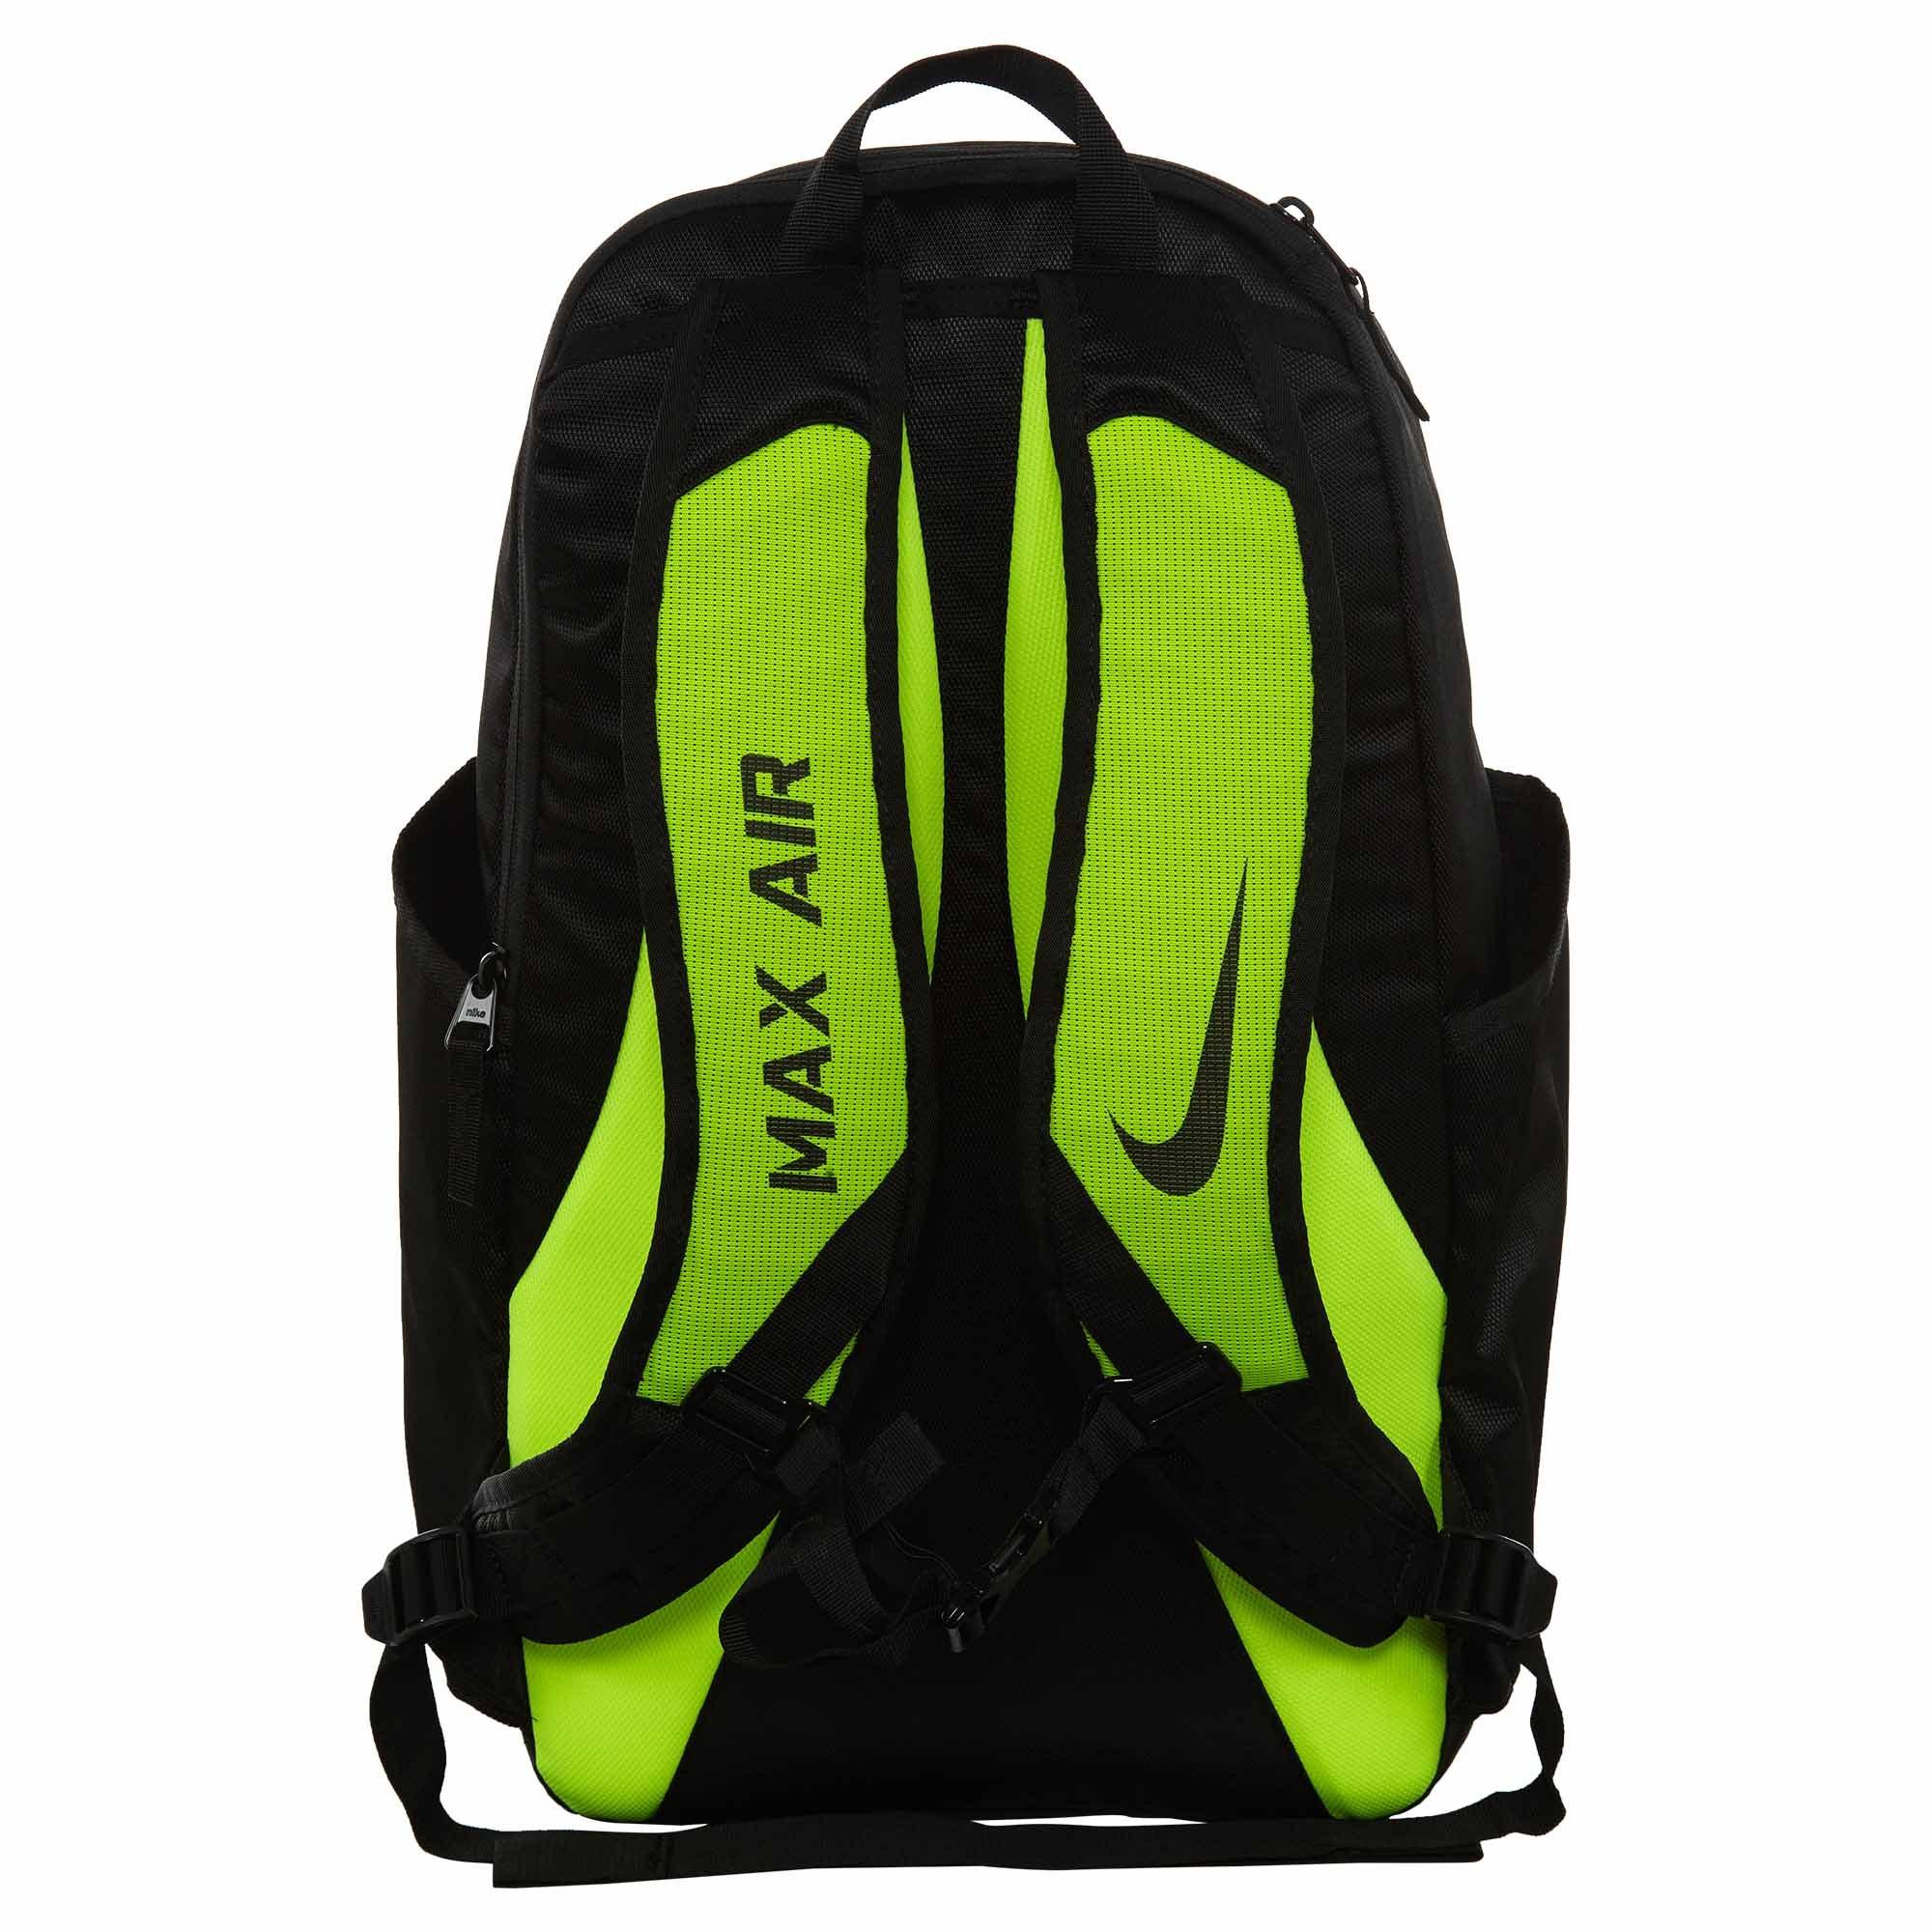 NIKE Vapor Power Training Backpack Black/Volt/Metallic Silver by NIKE (Image #3)